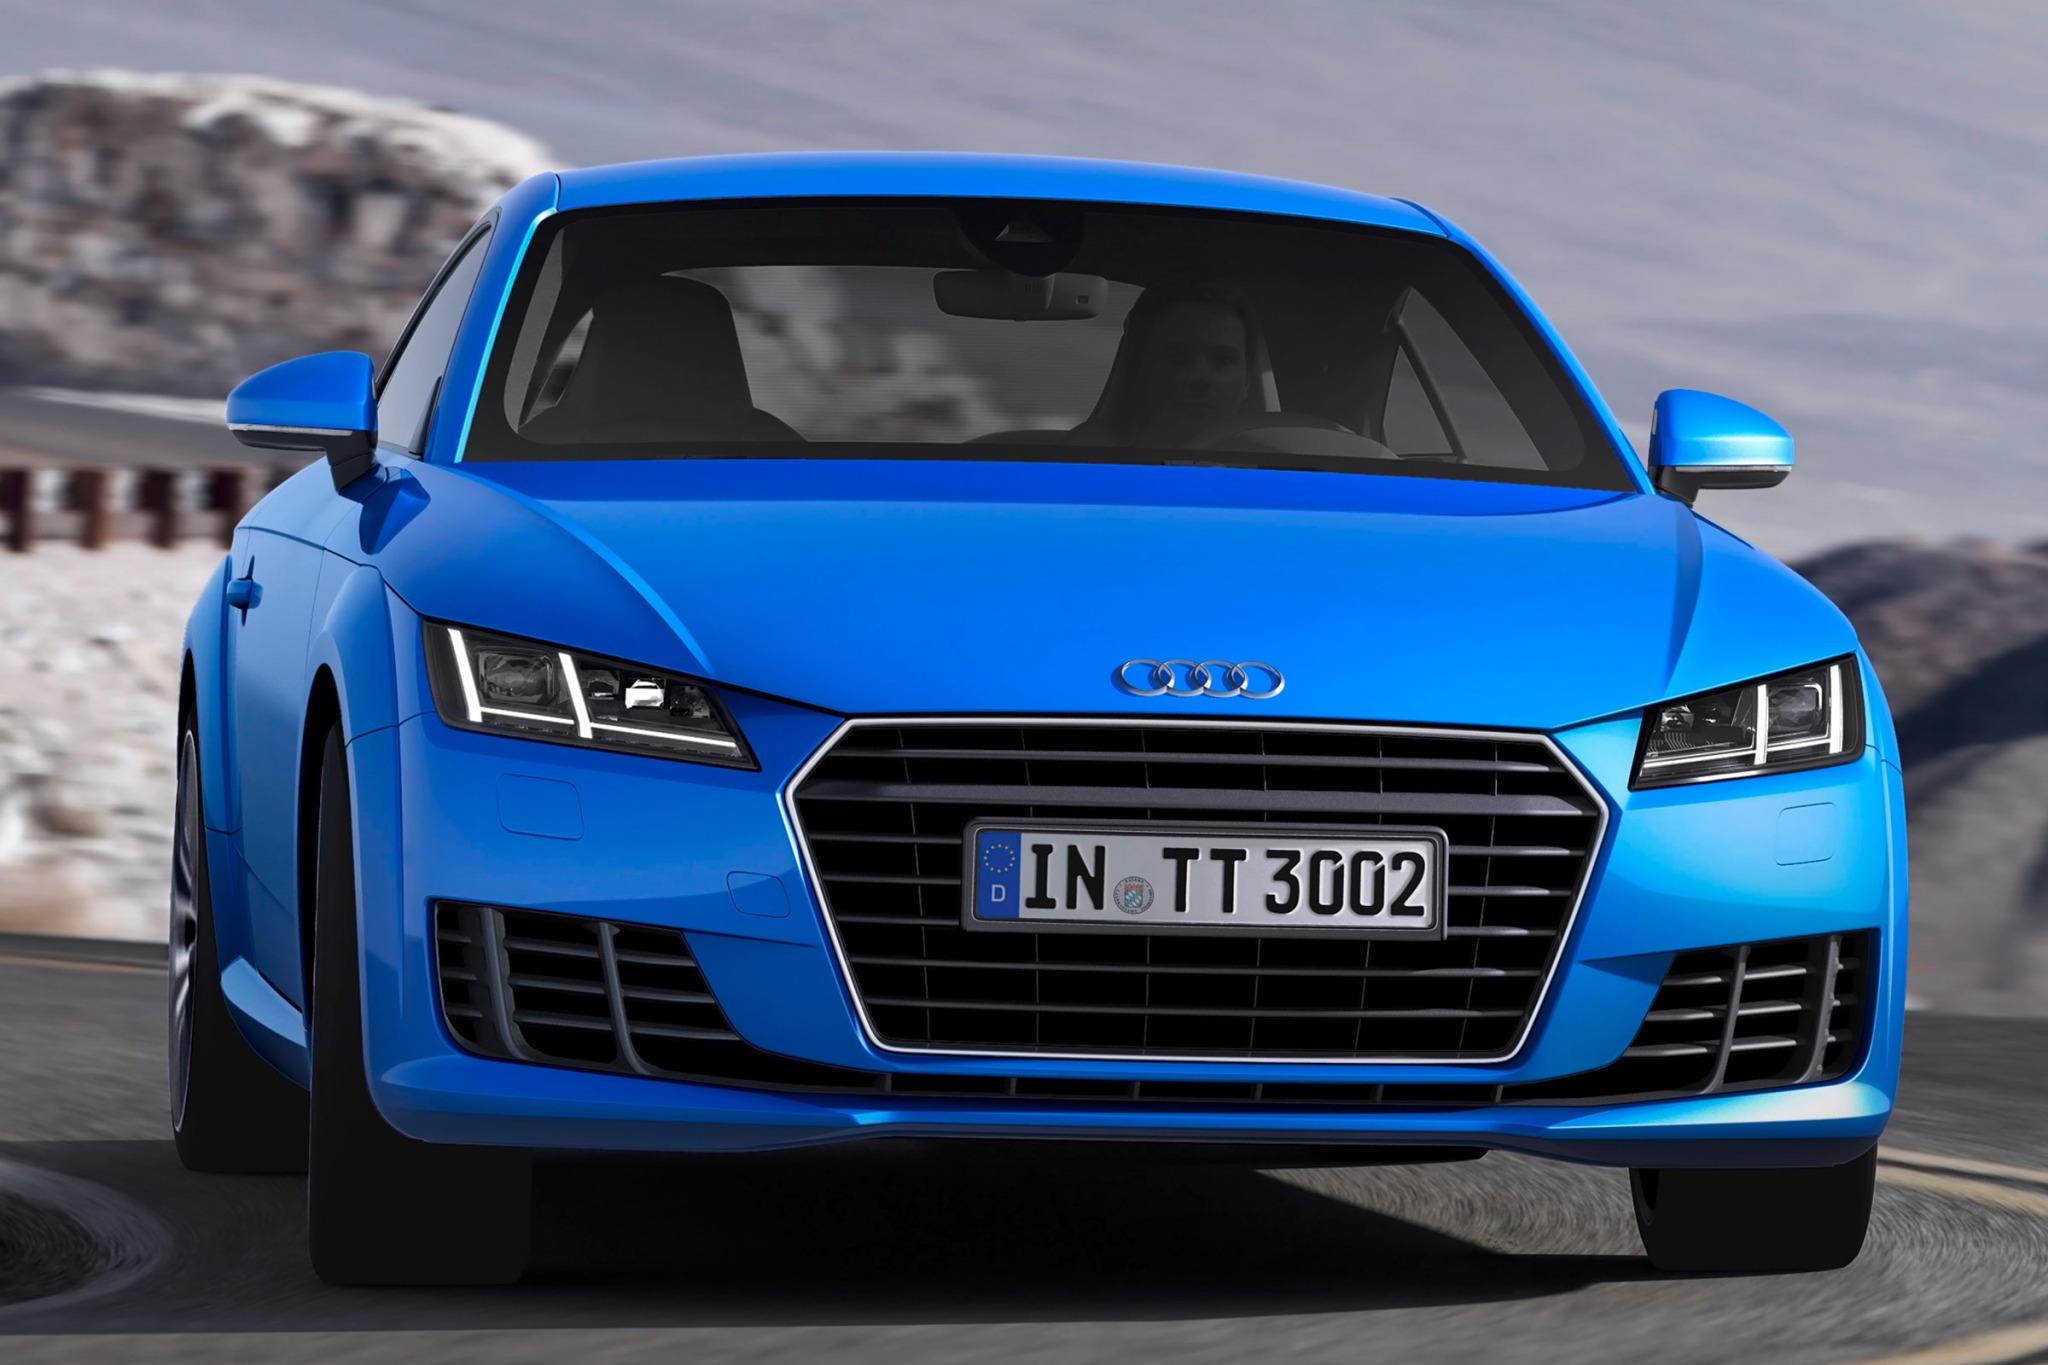 2016 Audi Tt Image 3